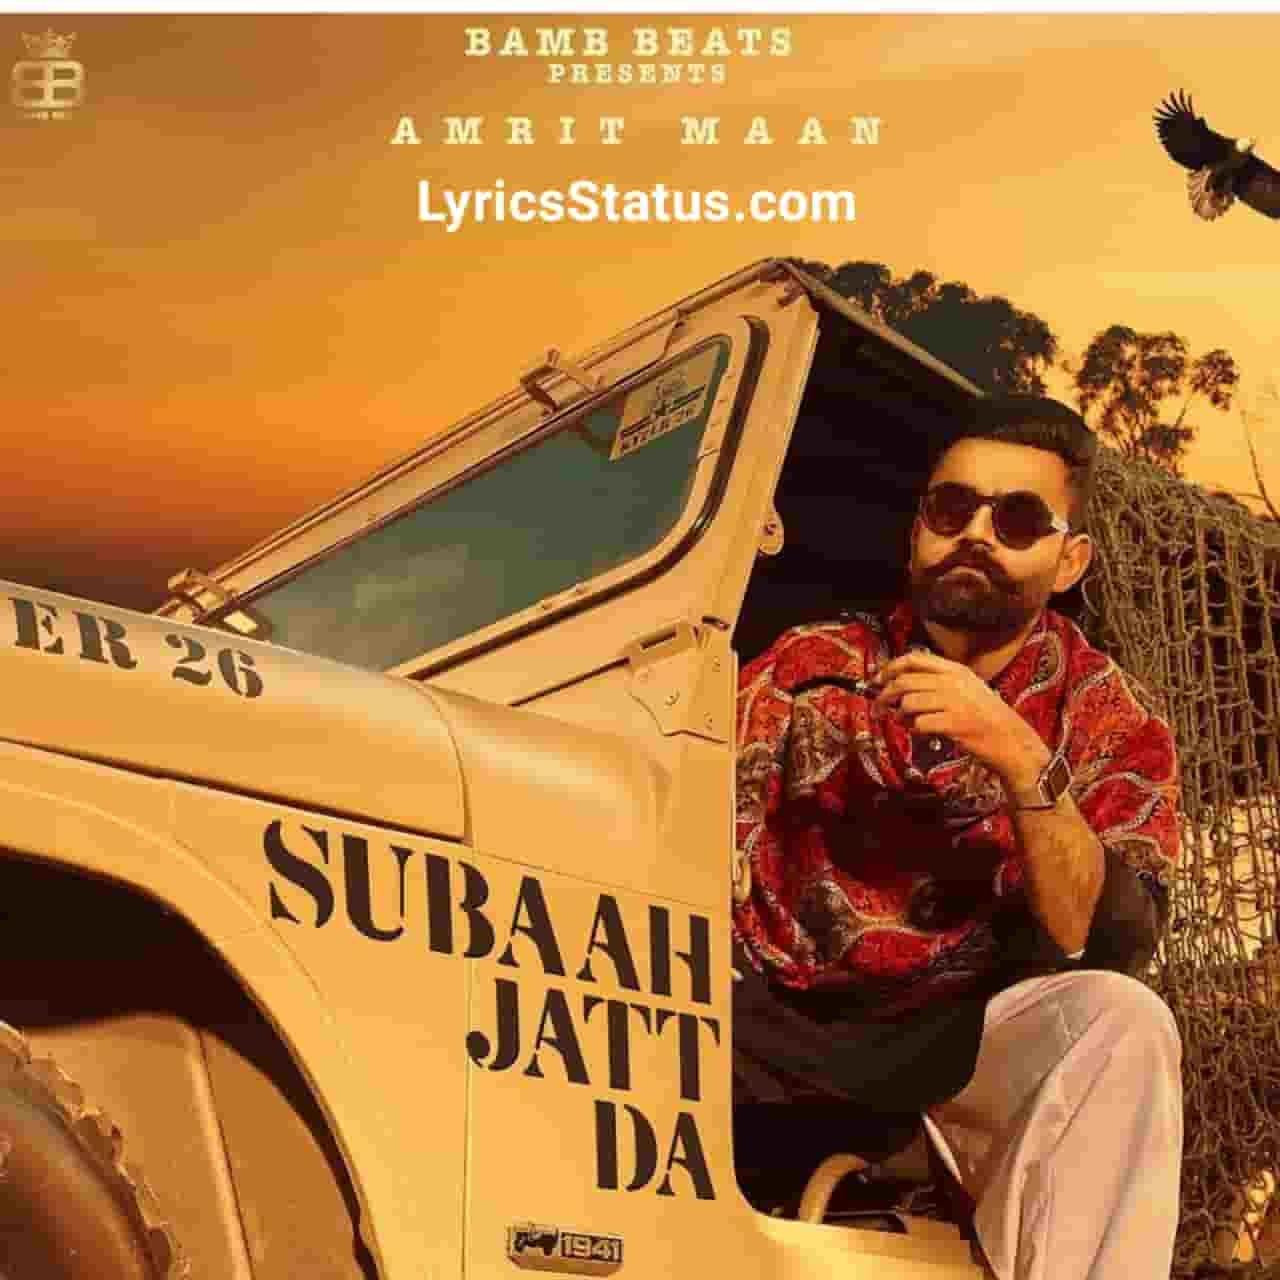 Amrit Maan New Song Subaah Jatt Da Lyrics Status Download Latest punjabi song Ho badmashi nahiyon jaane meriye Jatt da subaah hi edan dae